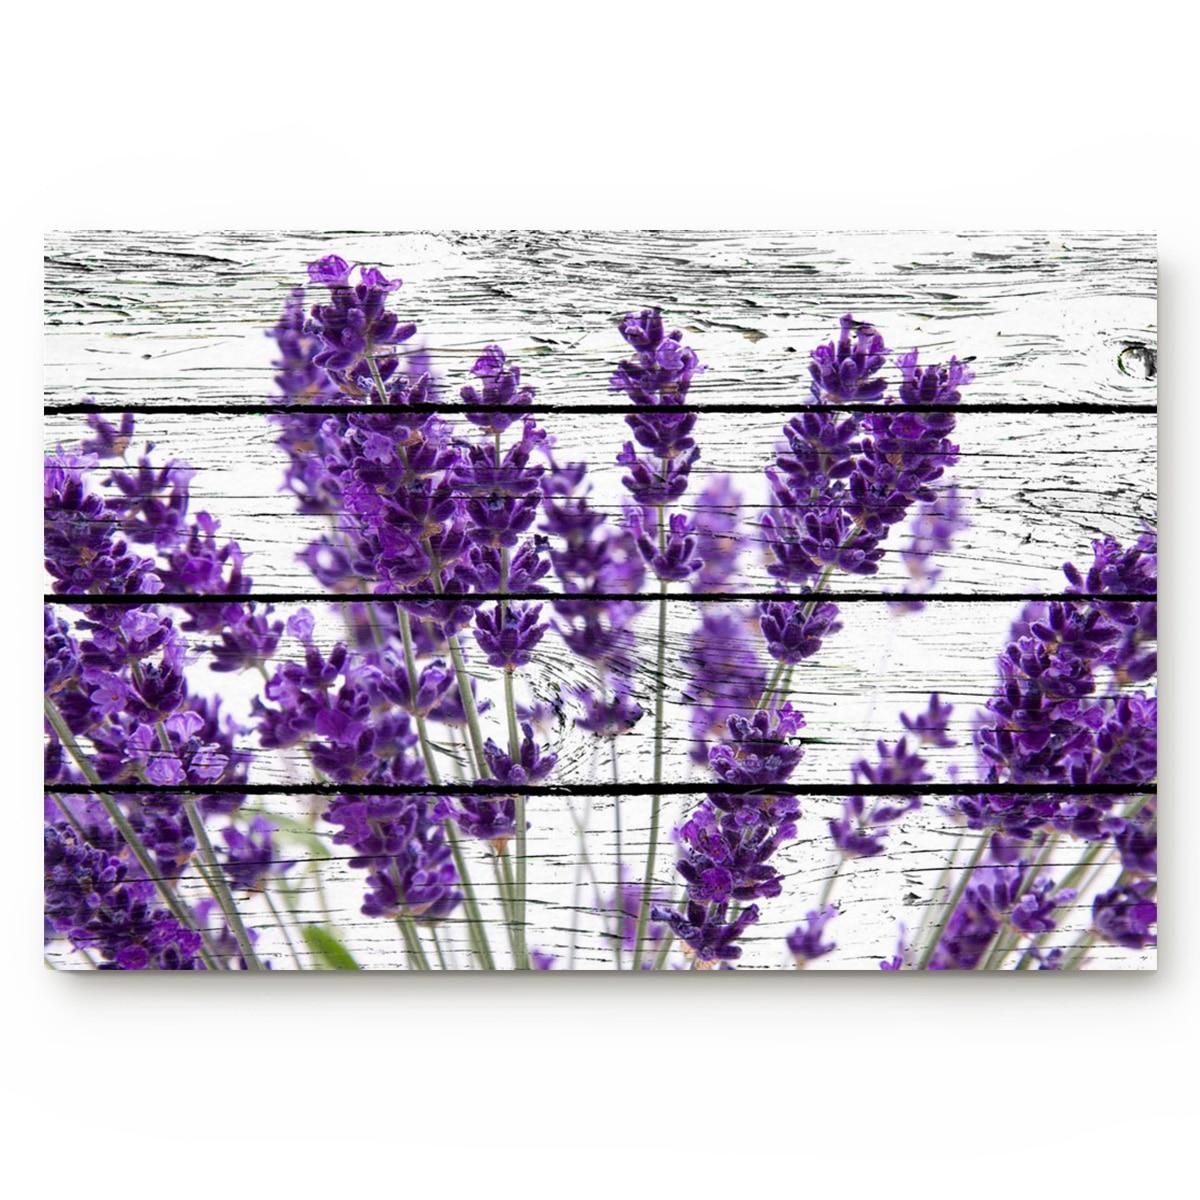 Purple Lavender Wood Board Vintage Style Bathroom Non Slip Doormat Bathroom Accessories Living Room Kitchen Doormat Mat Aliexpress